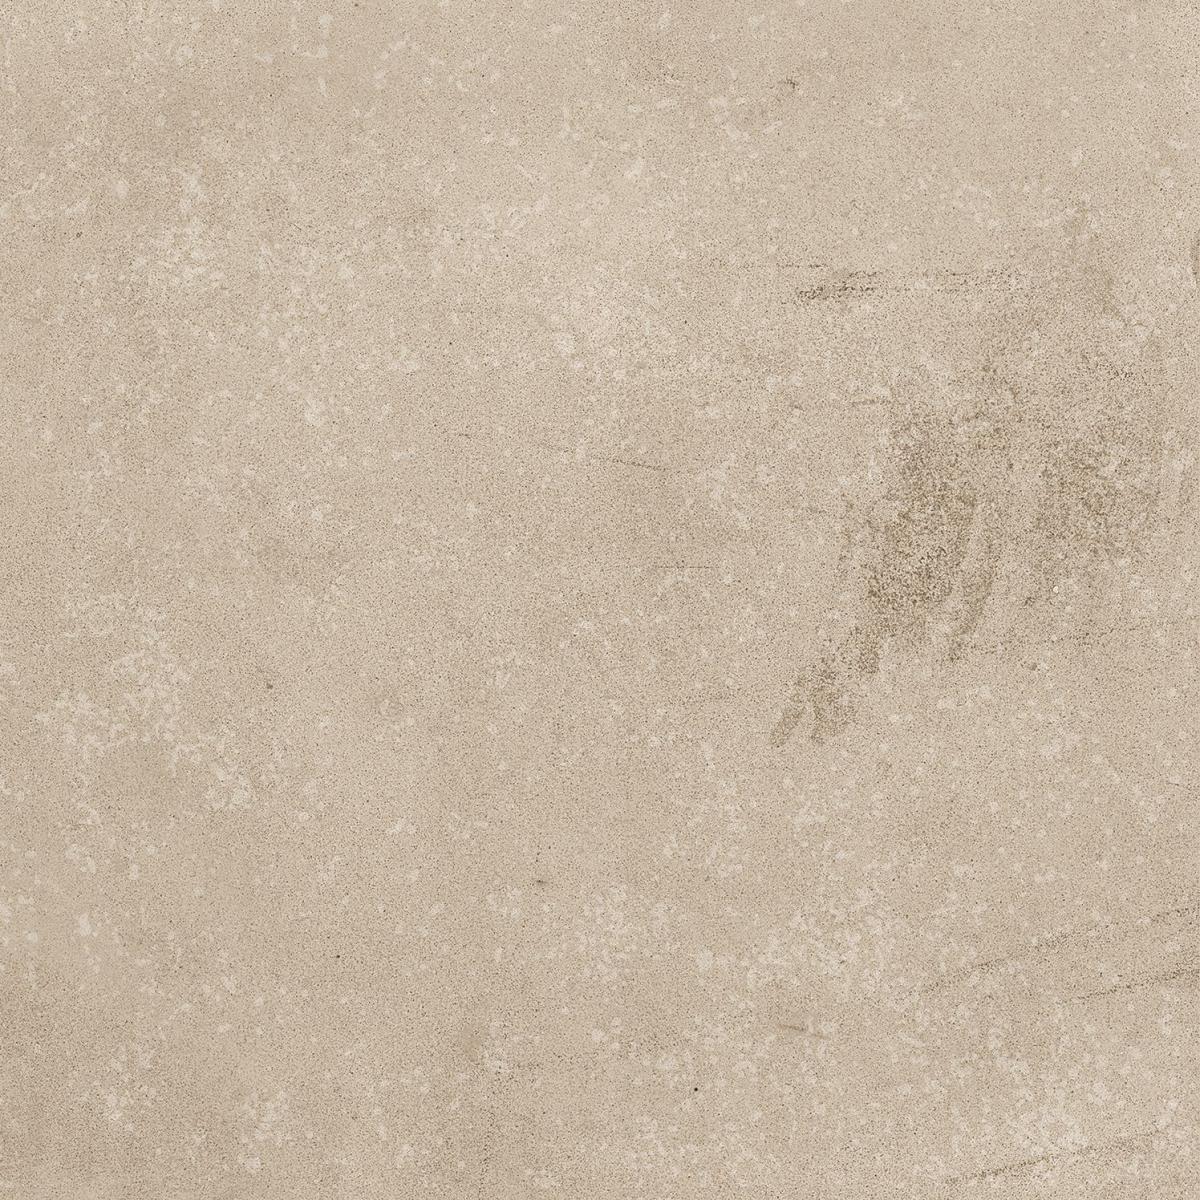 Vinci Blanco 25x25 (m2) Serie Vinci